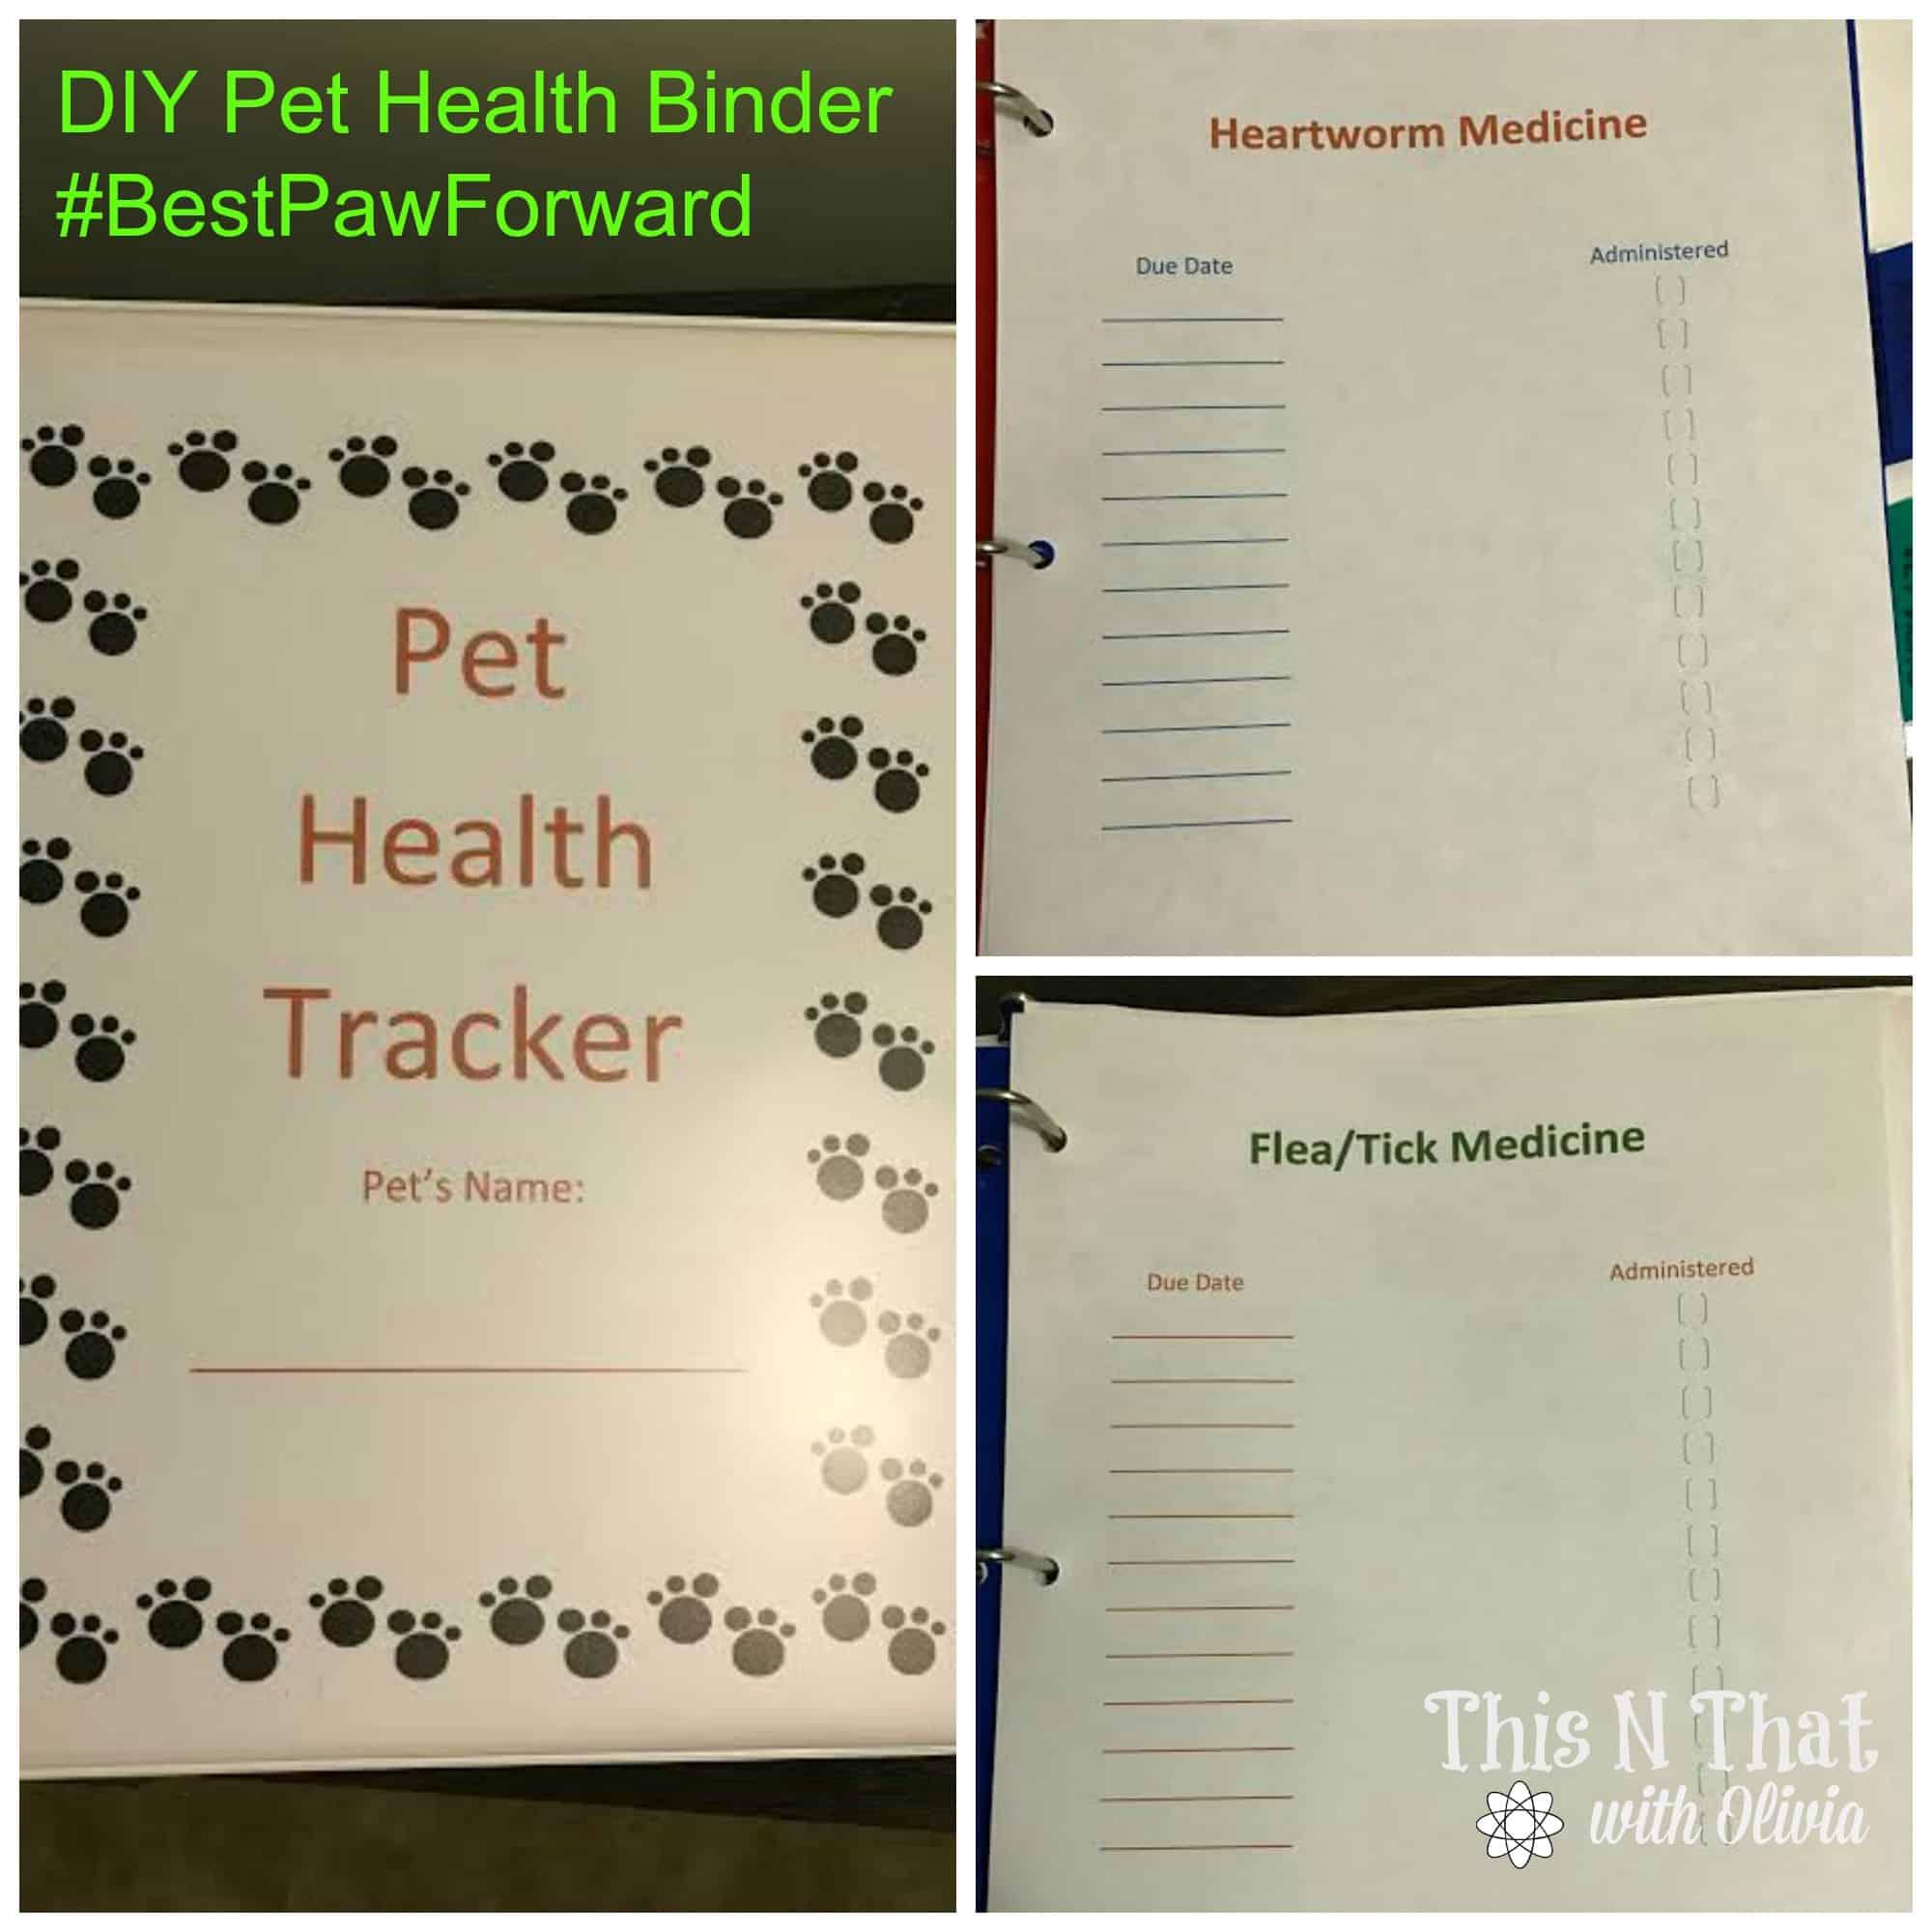 diy pet health binder bestpawforward ad pethealth